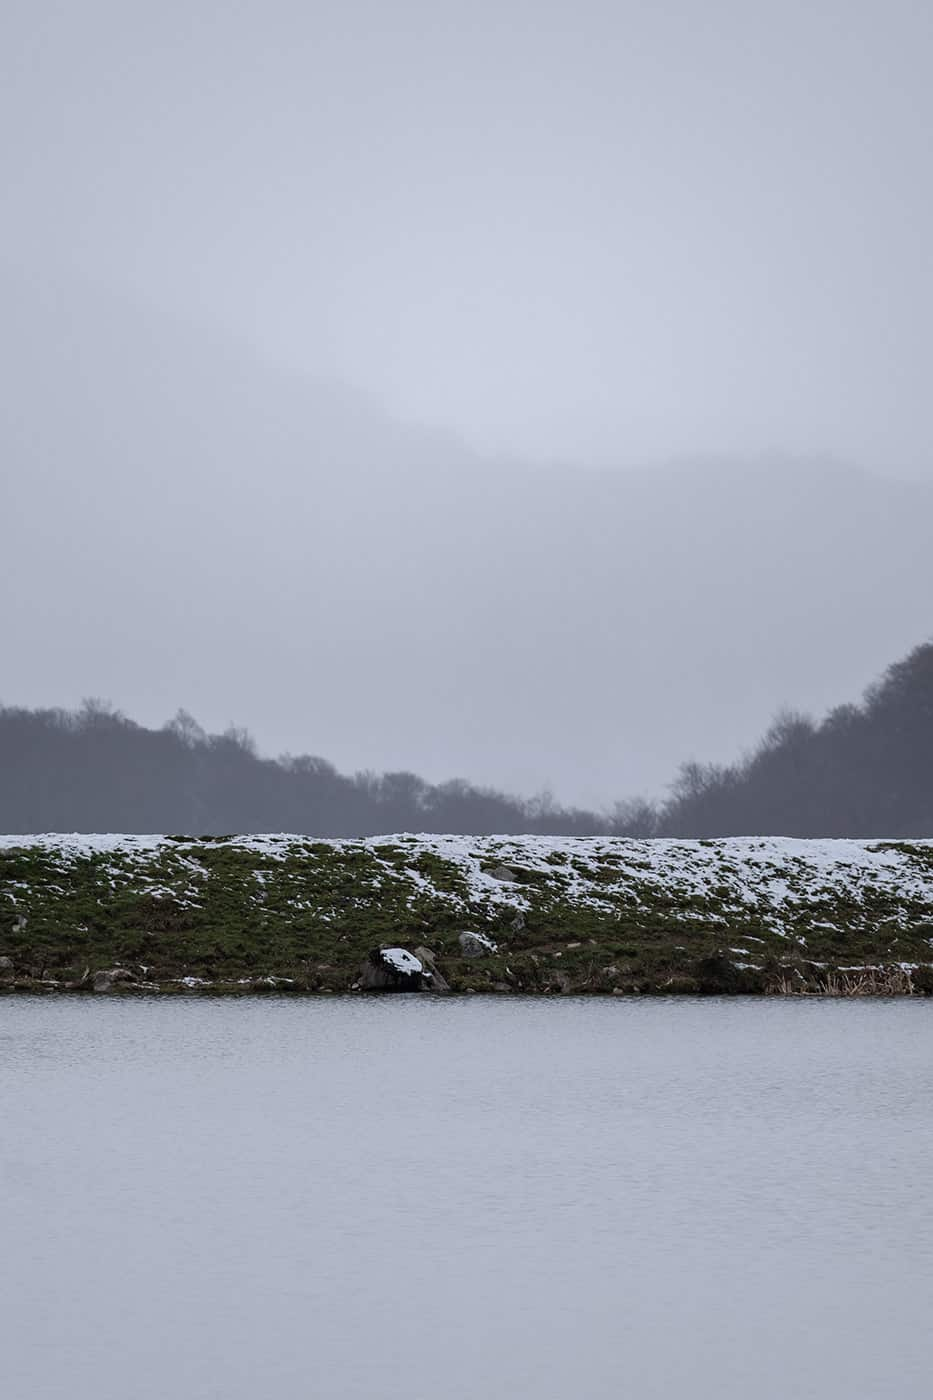 Lac de Payolle et brouillard